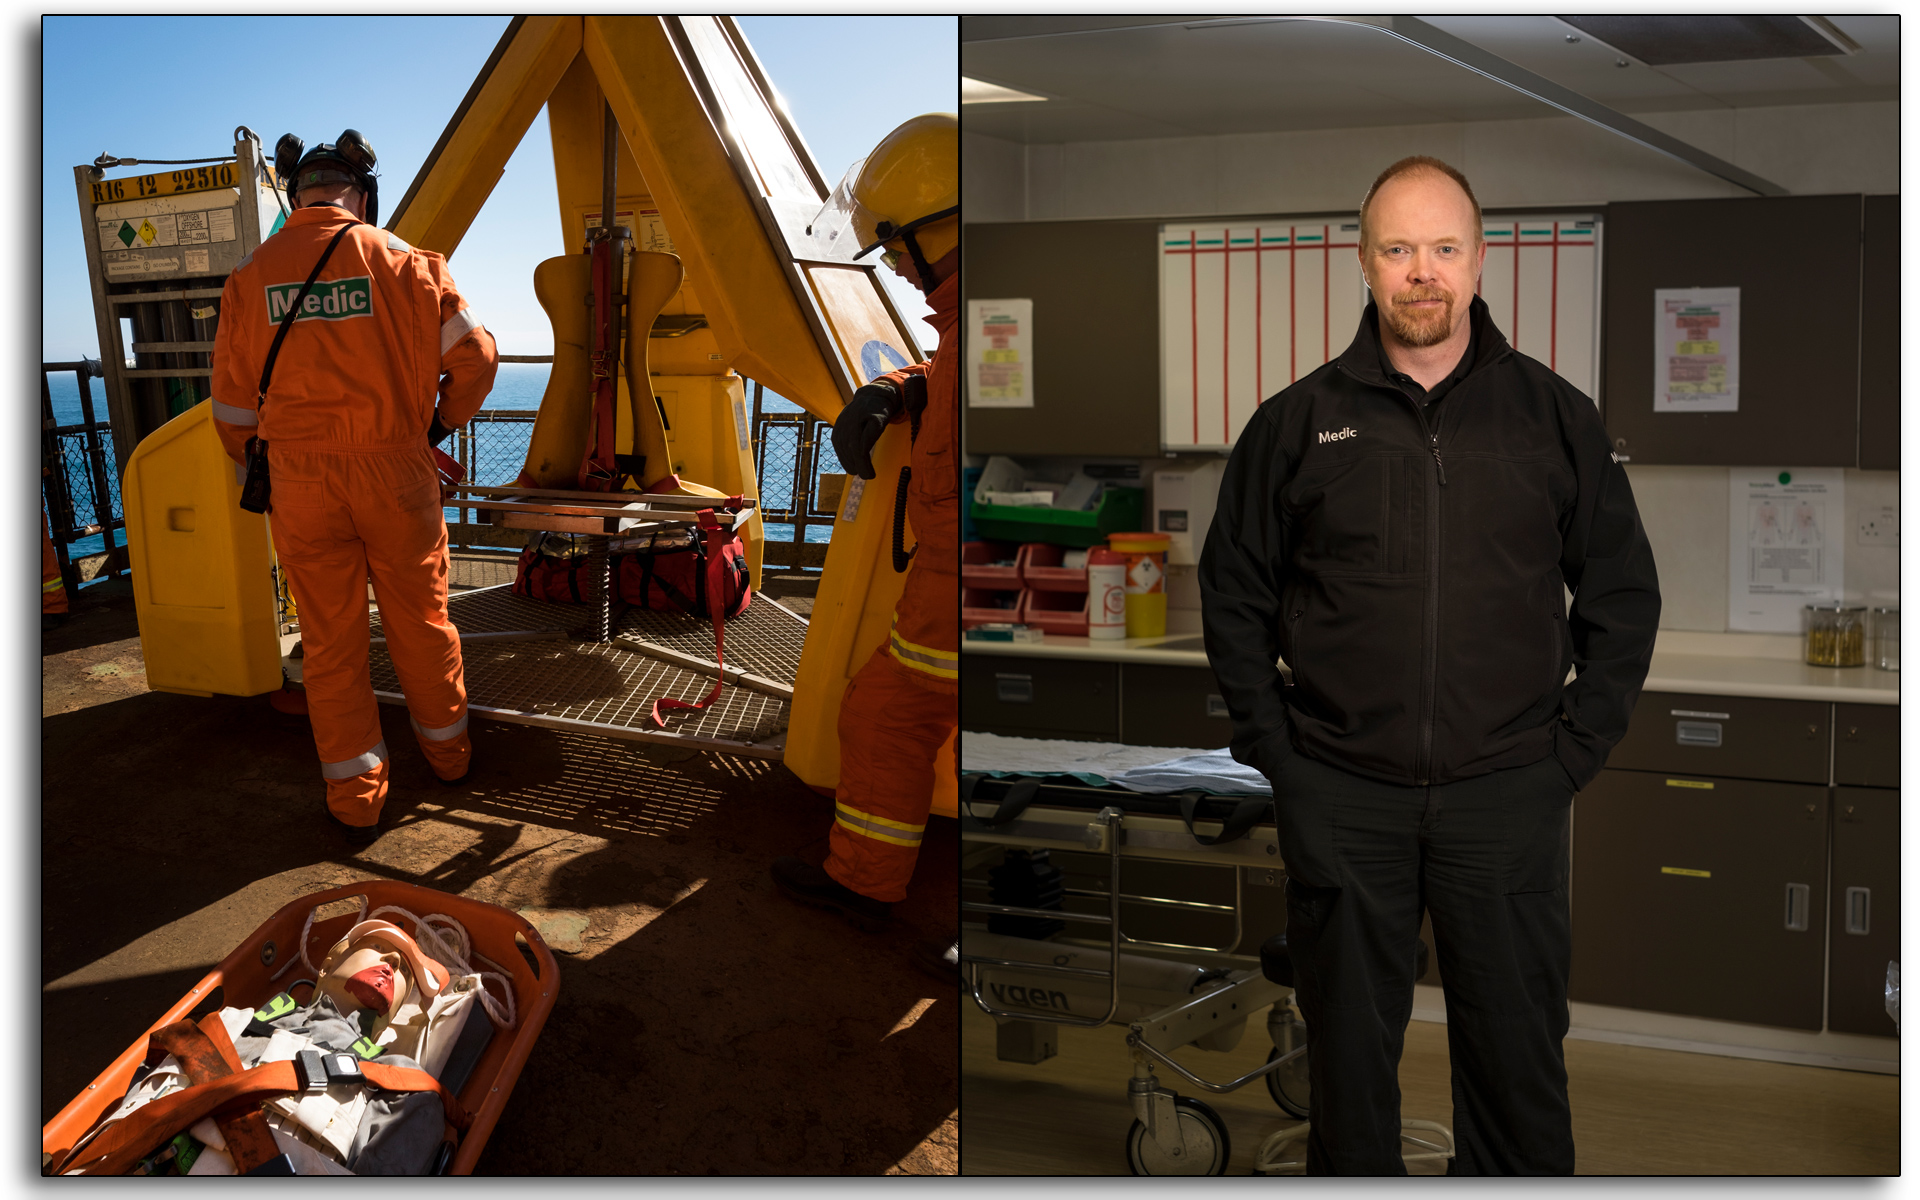 Medic, oil and gas industry, Andrew Macdonald, sickbay, medcenter, photo by Lee Ramsden,.jpg